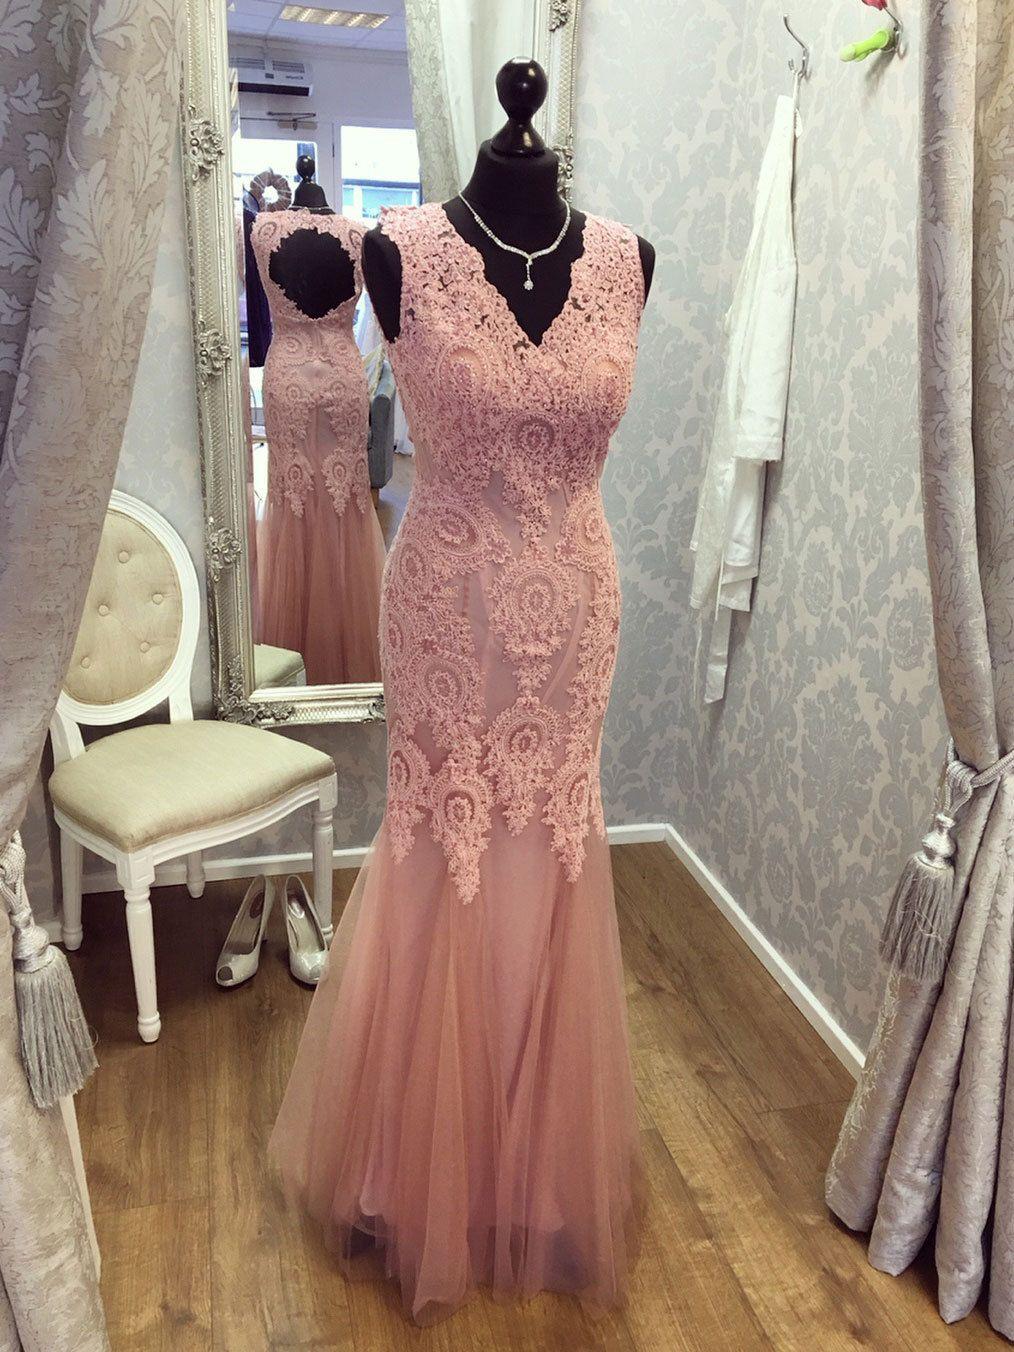 e117e462c04 Lazycatie Women  Long V Neck Lace Appliques Tulle Prom Dress ...